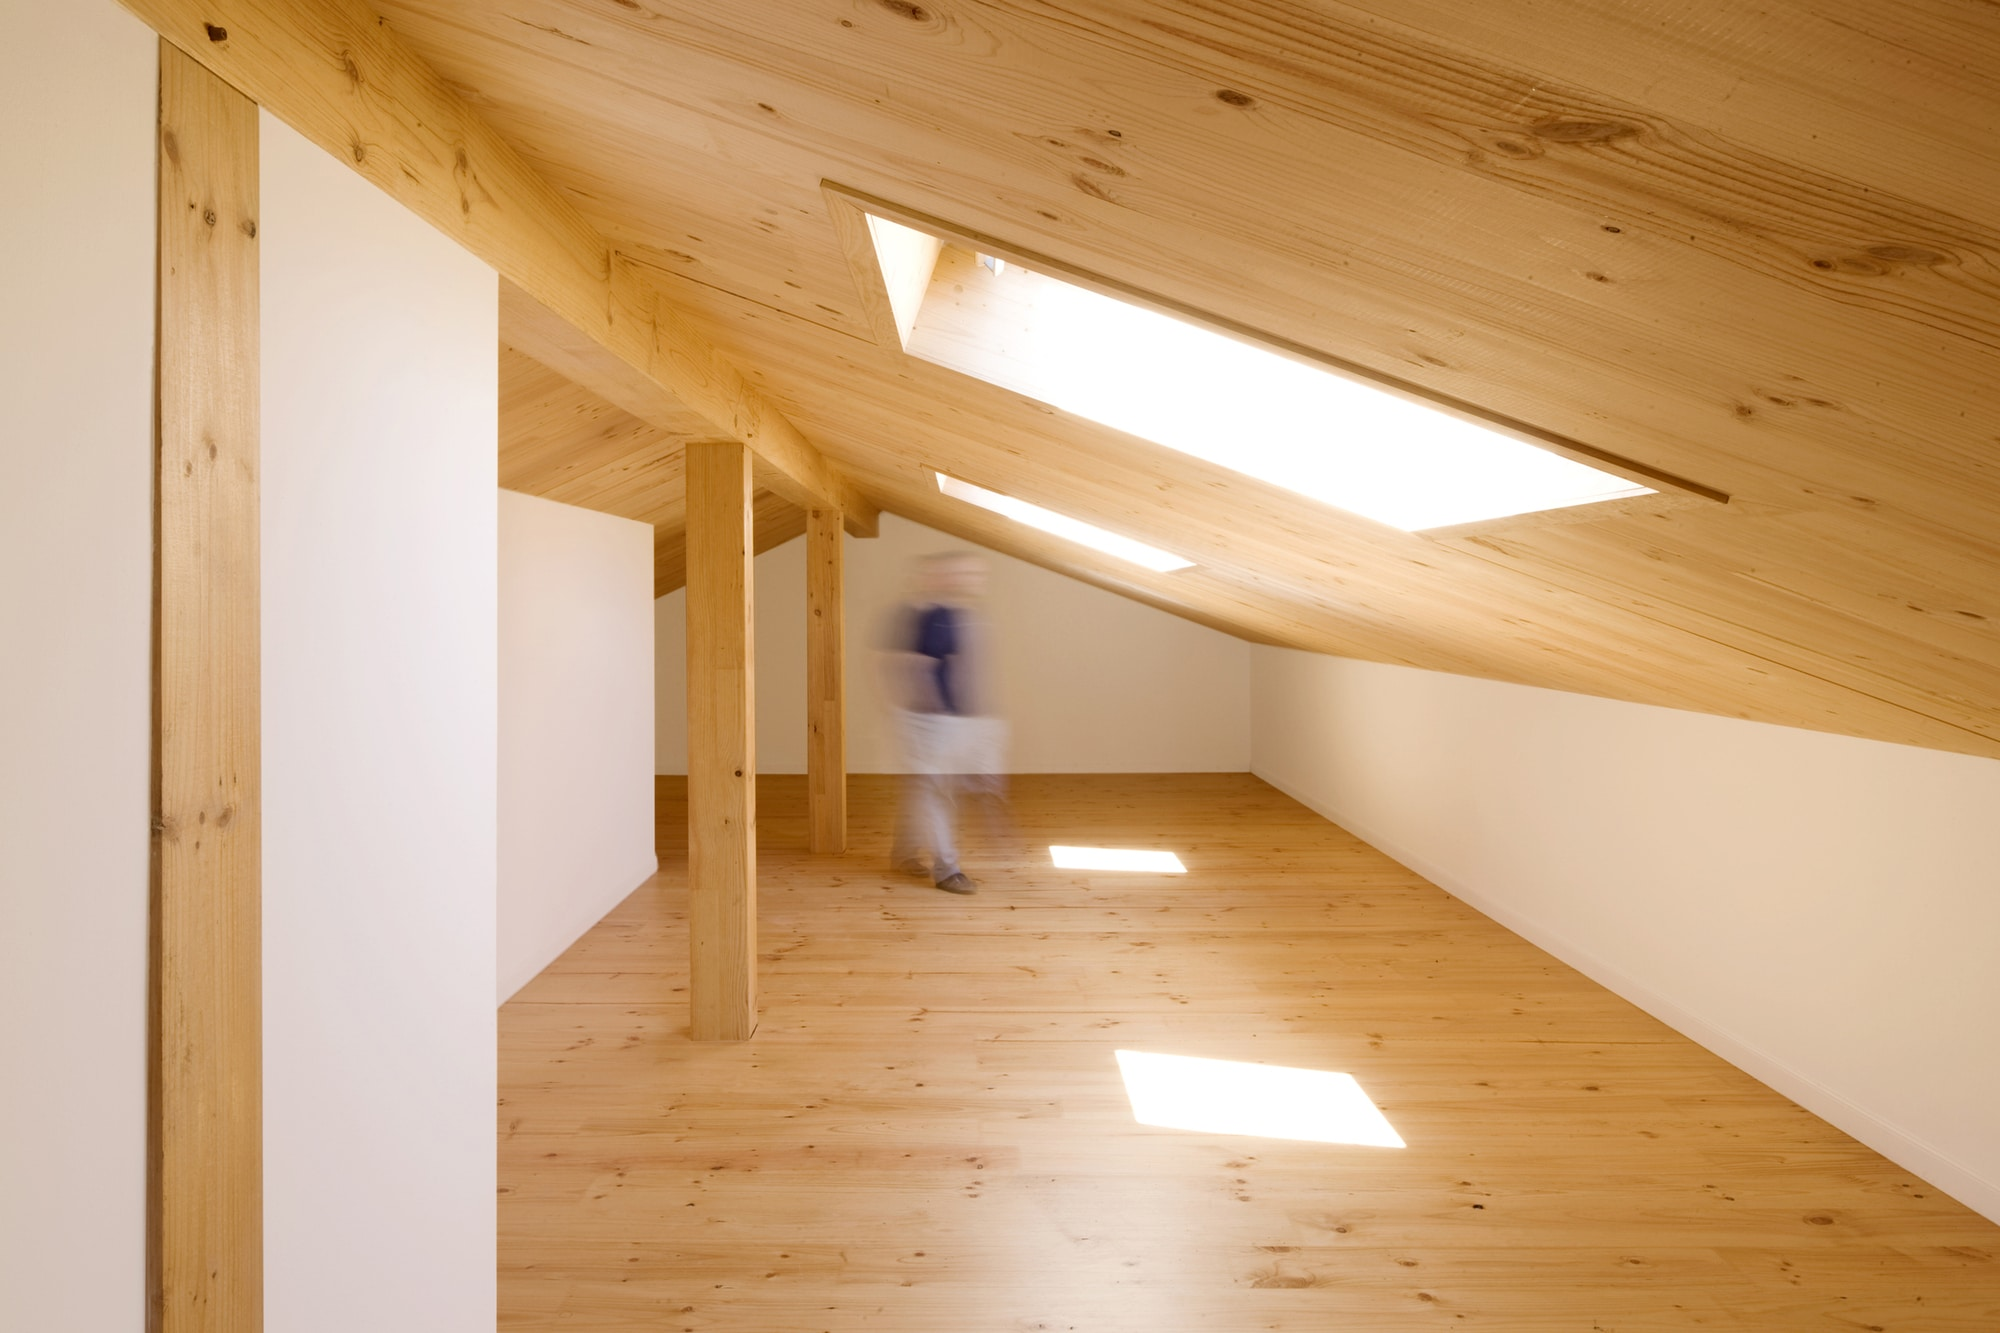 Dise o de casa r stica de piedra planos construye hogar - Madera para techos interiores ...